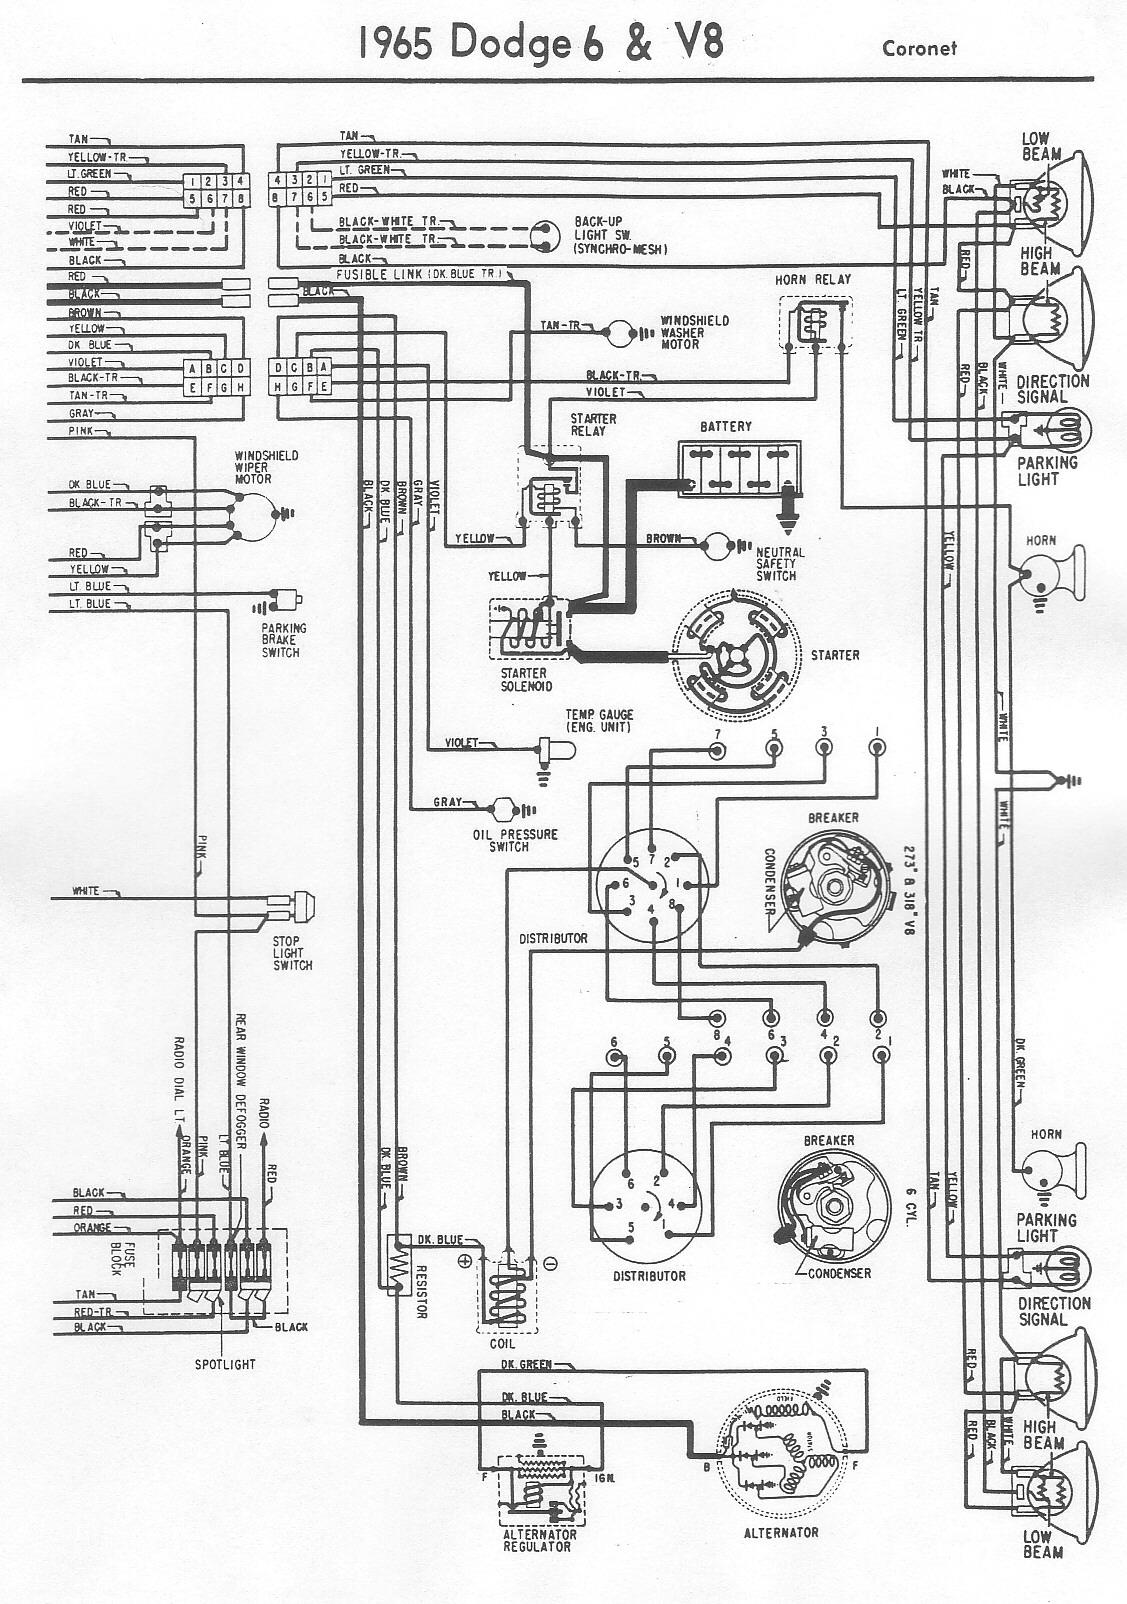 dodge dakota wiring wiring diagram on 1996 dodge dakota engine wiring harness dodge dakota wiring 1 [ 1127 x 1604 Pixel ]